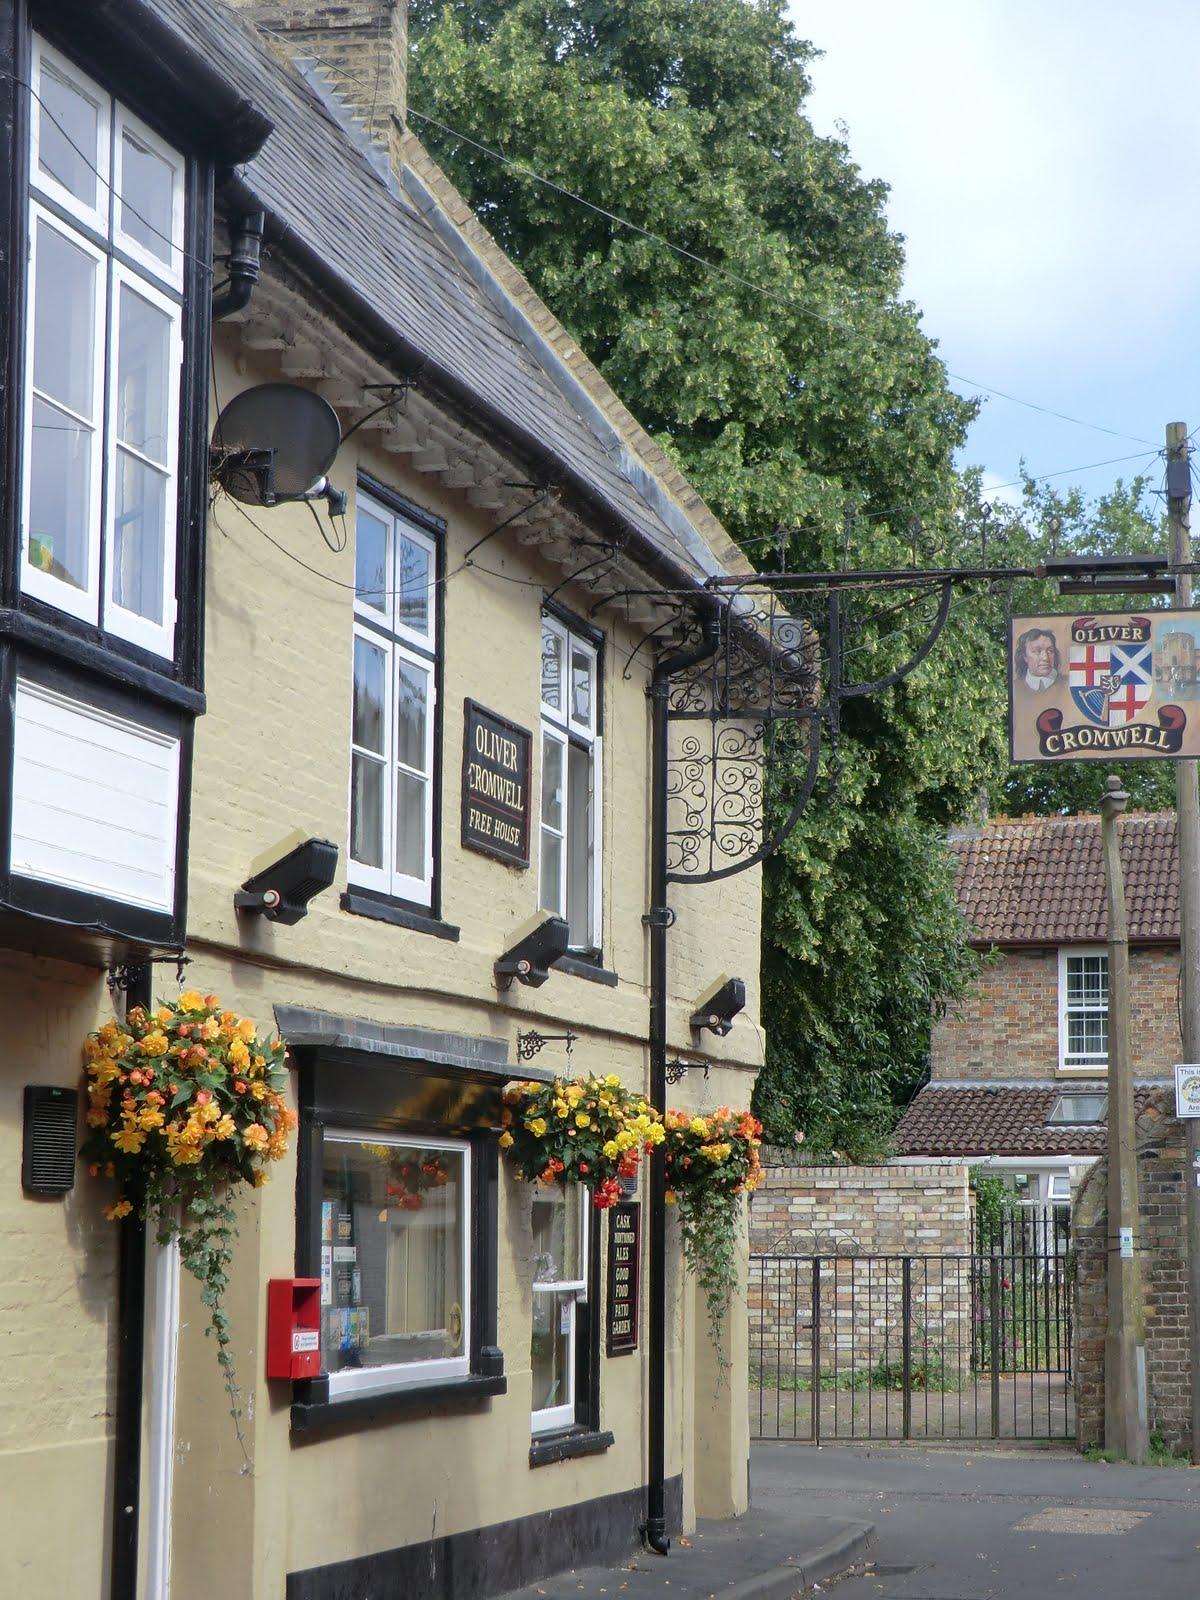 CIMG7856 Oliver Cromwell pub, St Ives